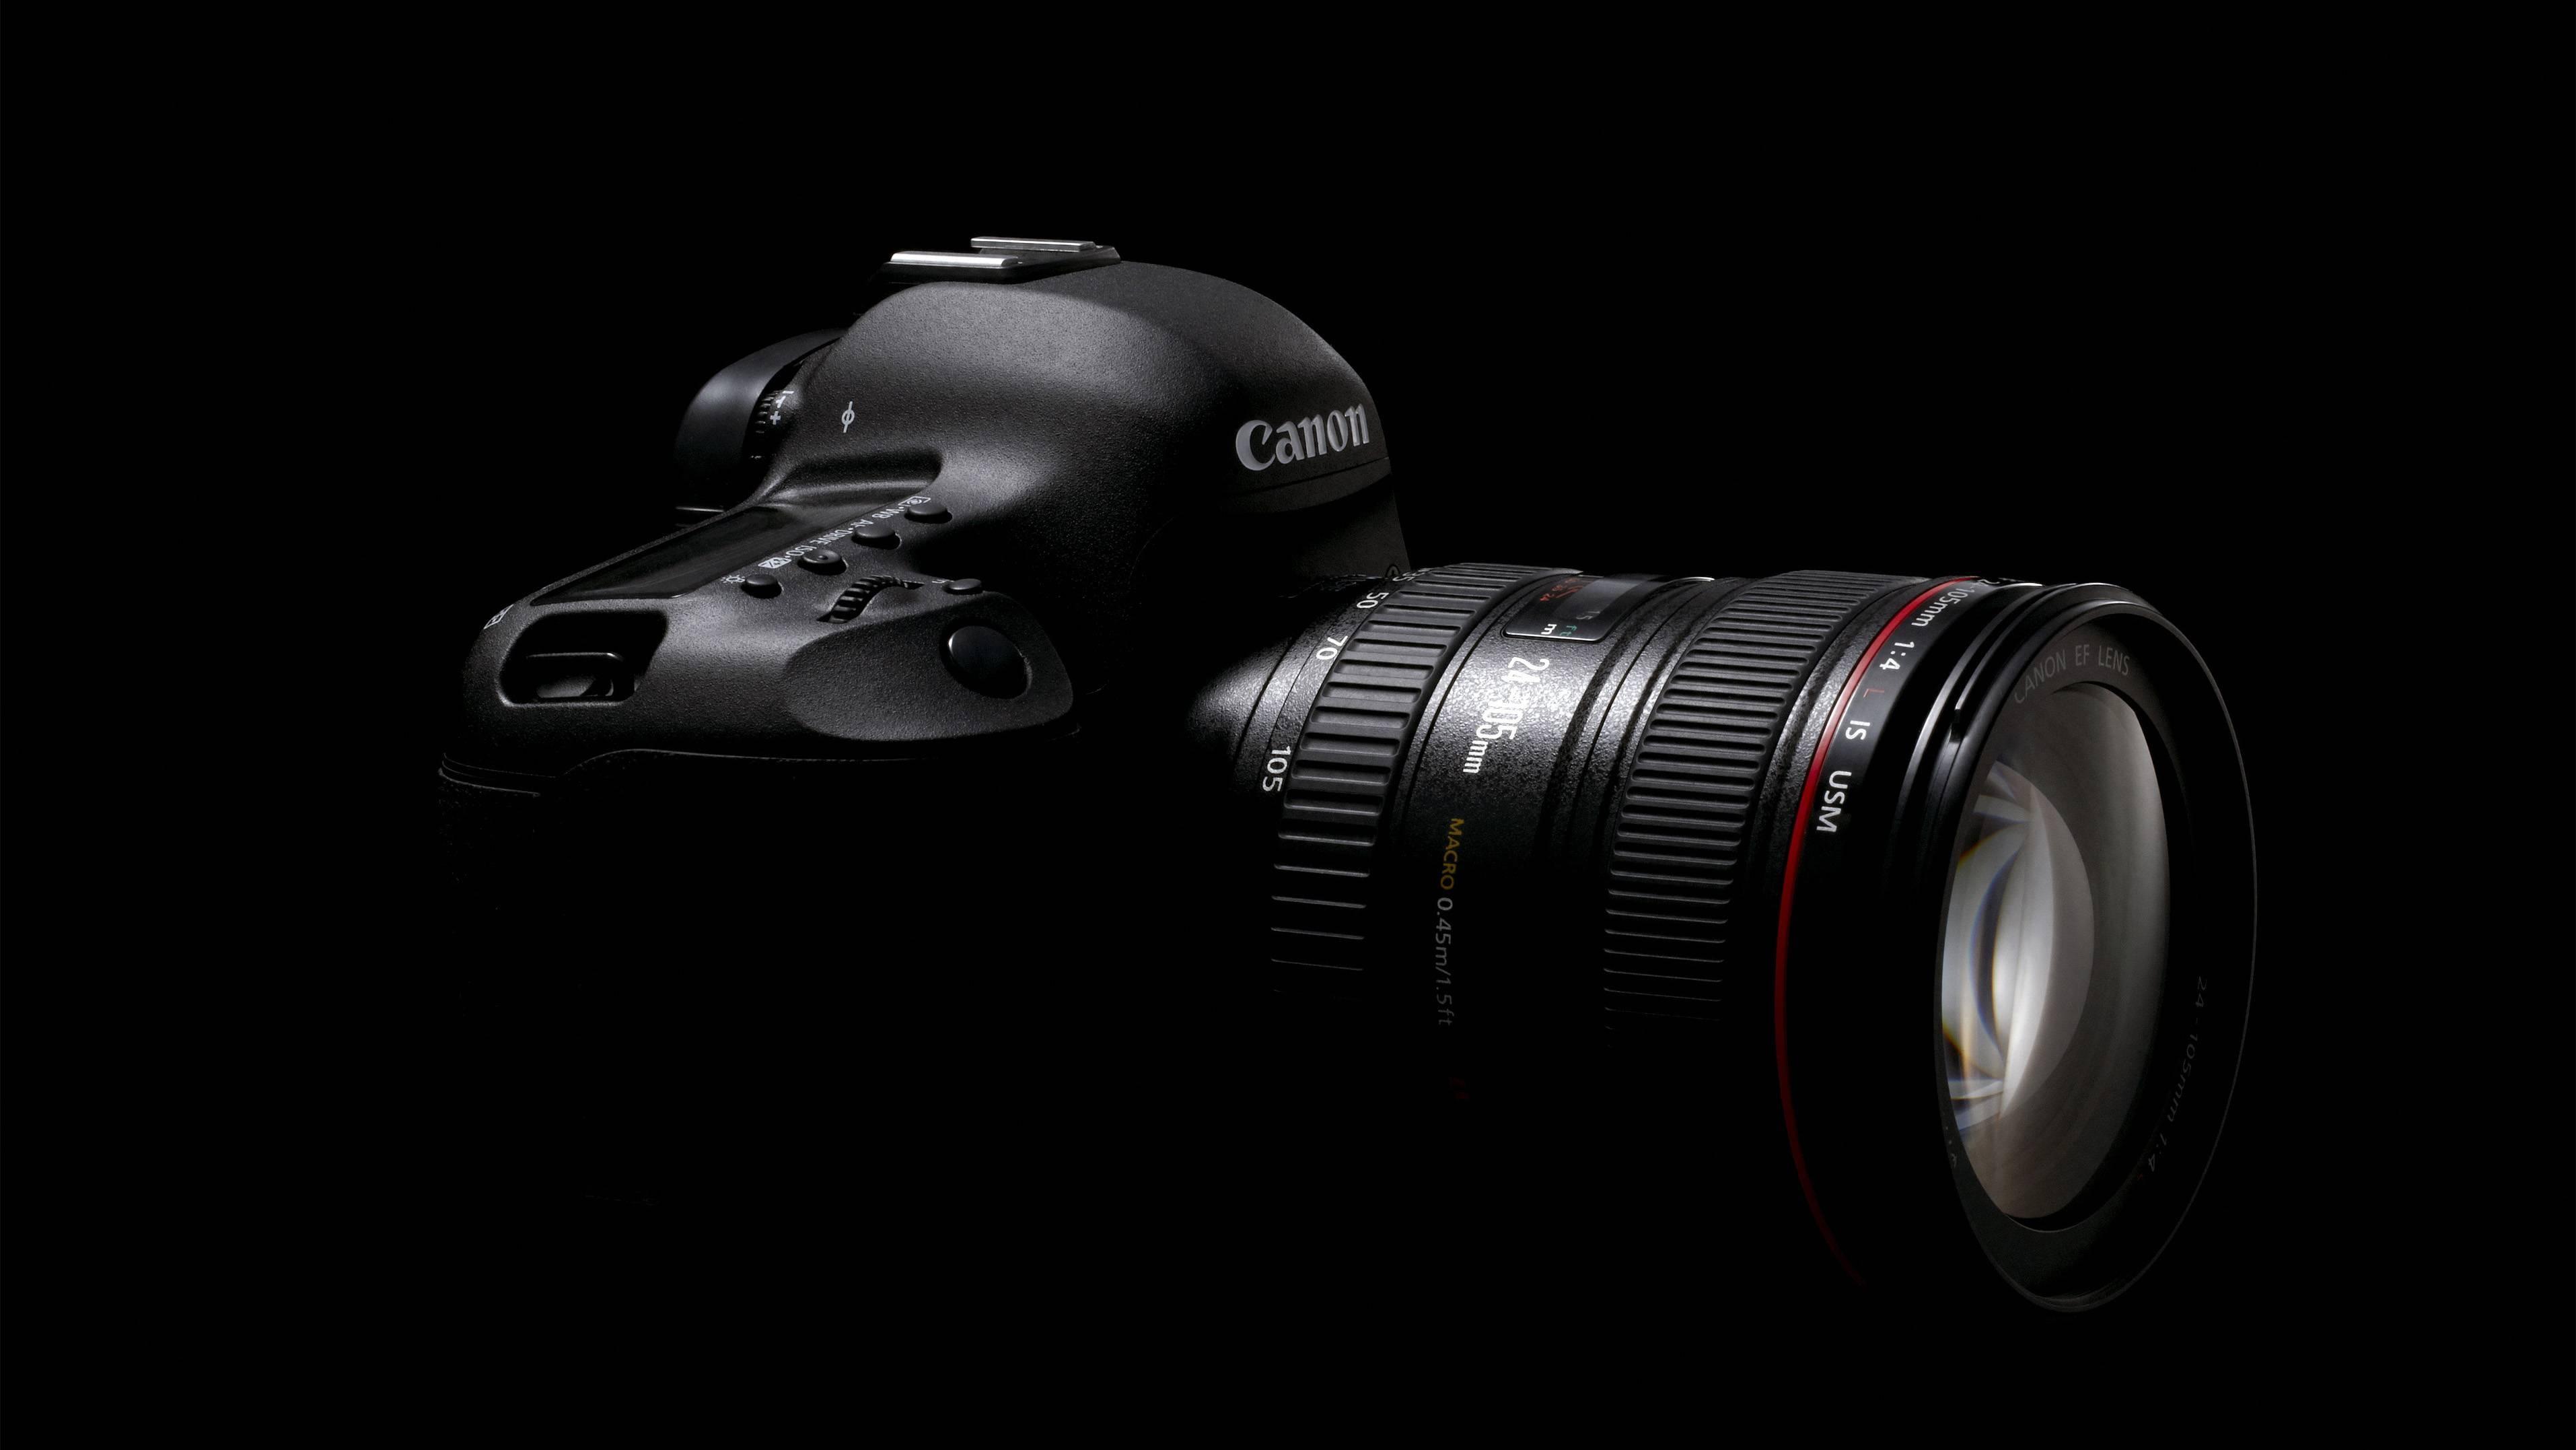 Wallpaper Canon EOS 5D Mark IV Review CES 2017 4k Video